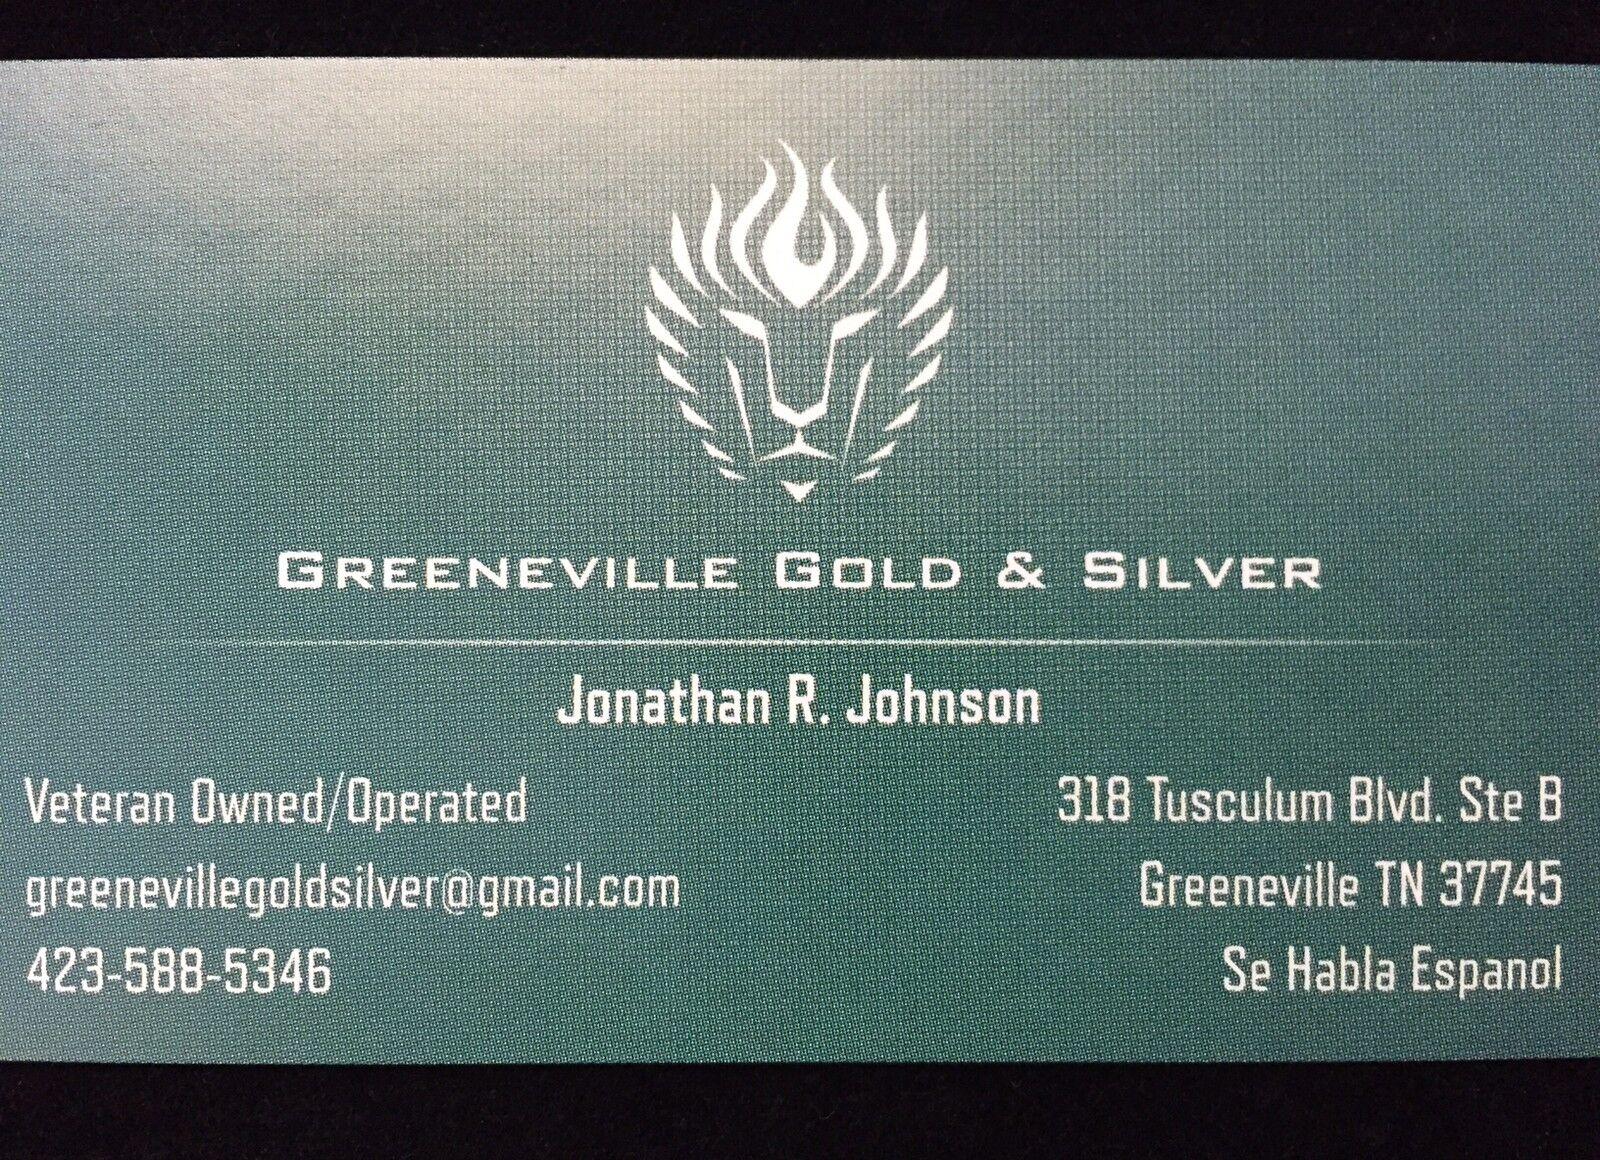 Greeneville Gold & Silver